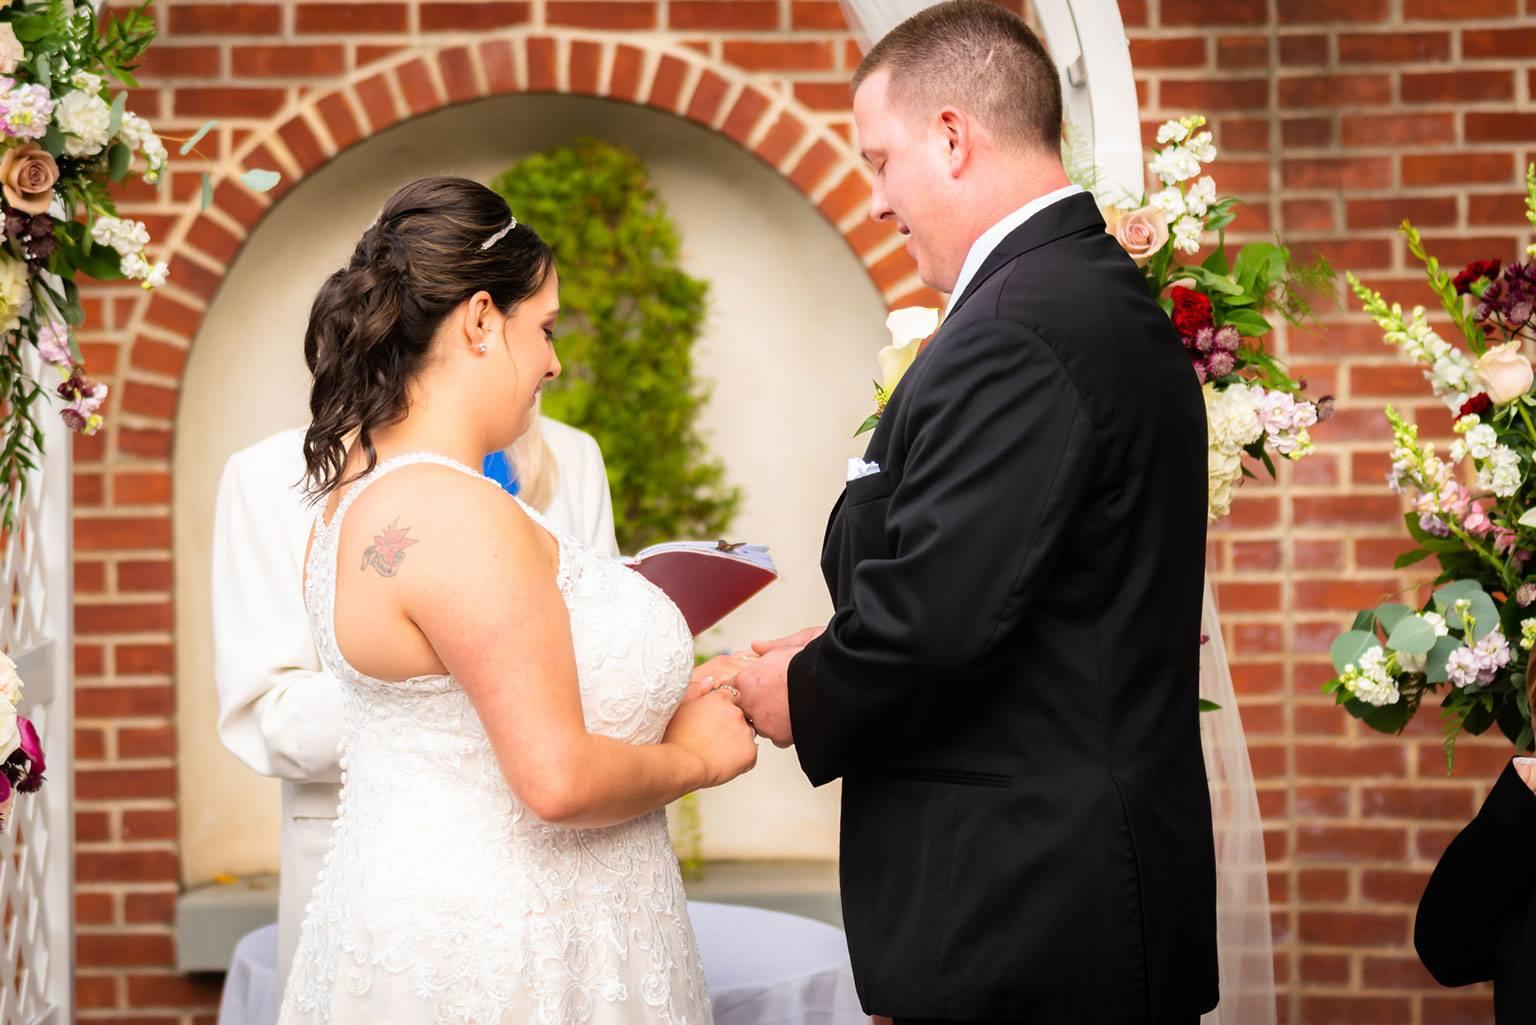 Natalie & Steven's Wedding at The Radnor